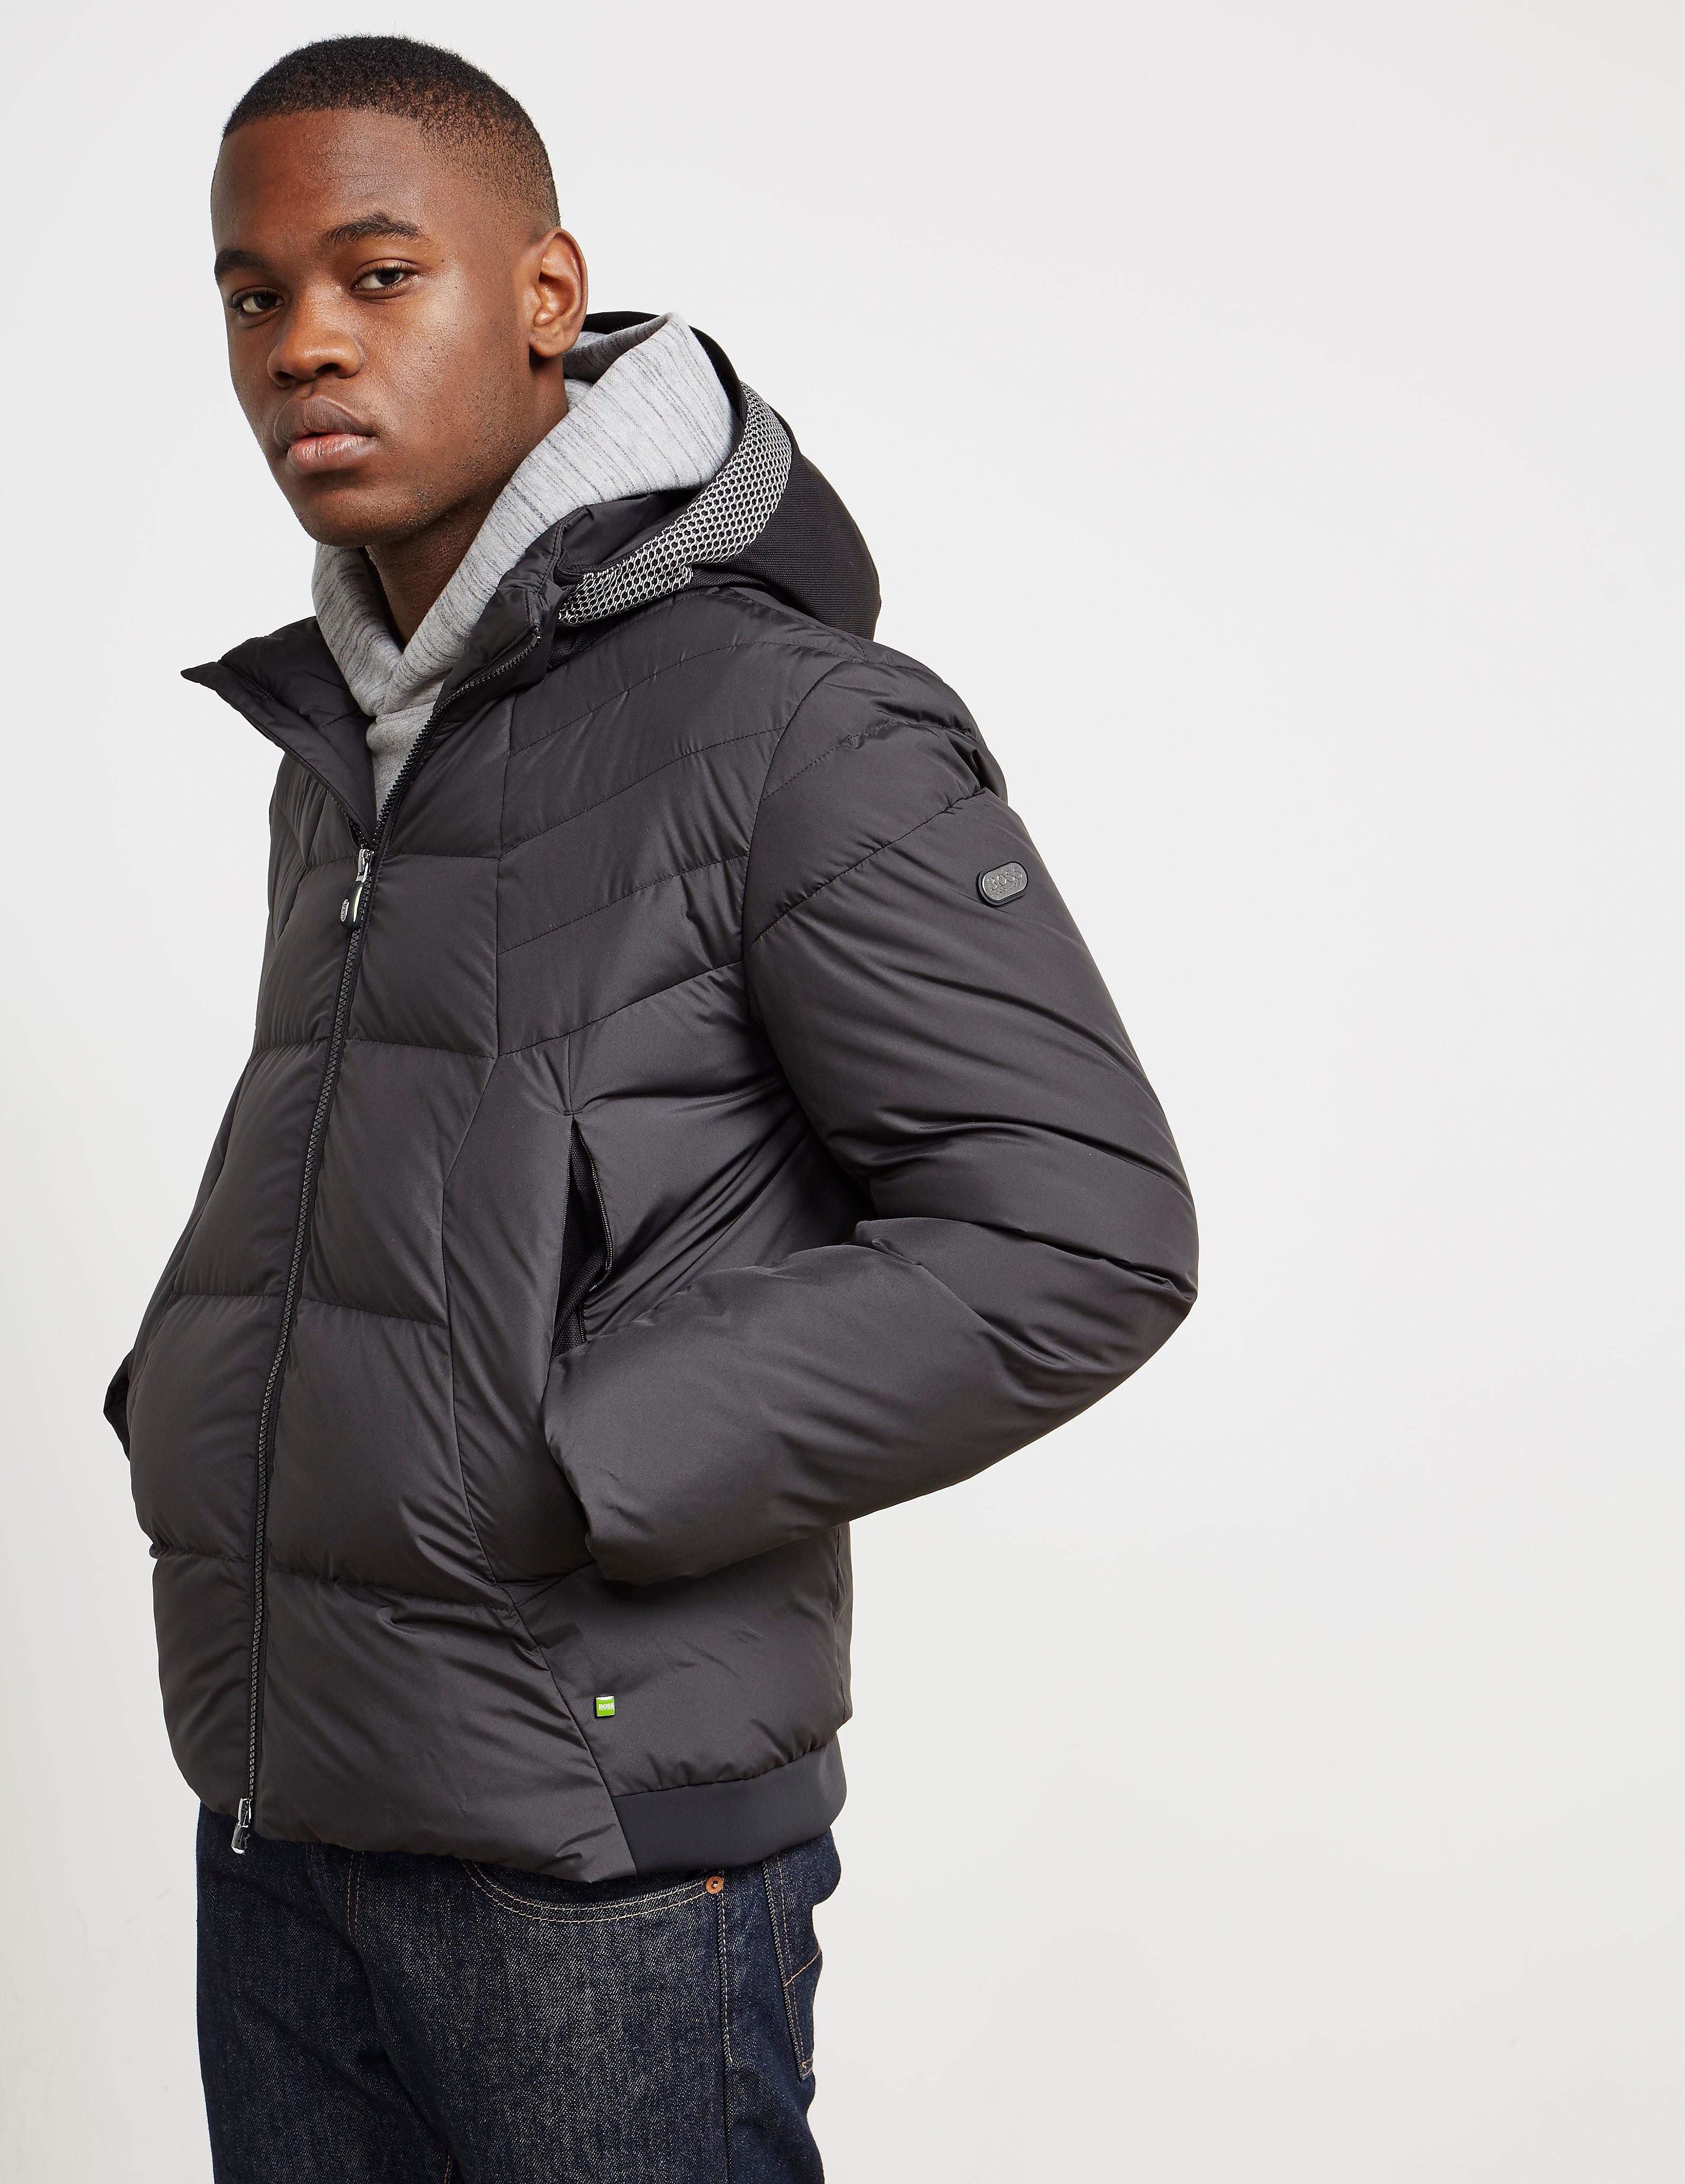 BOSS Green Padded Jacket